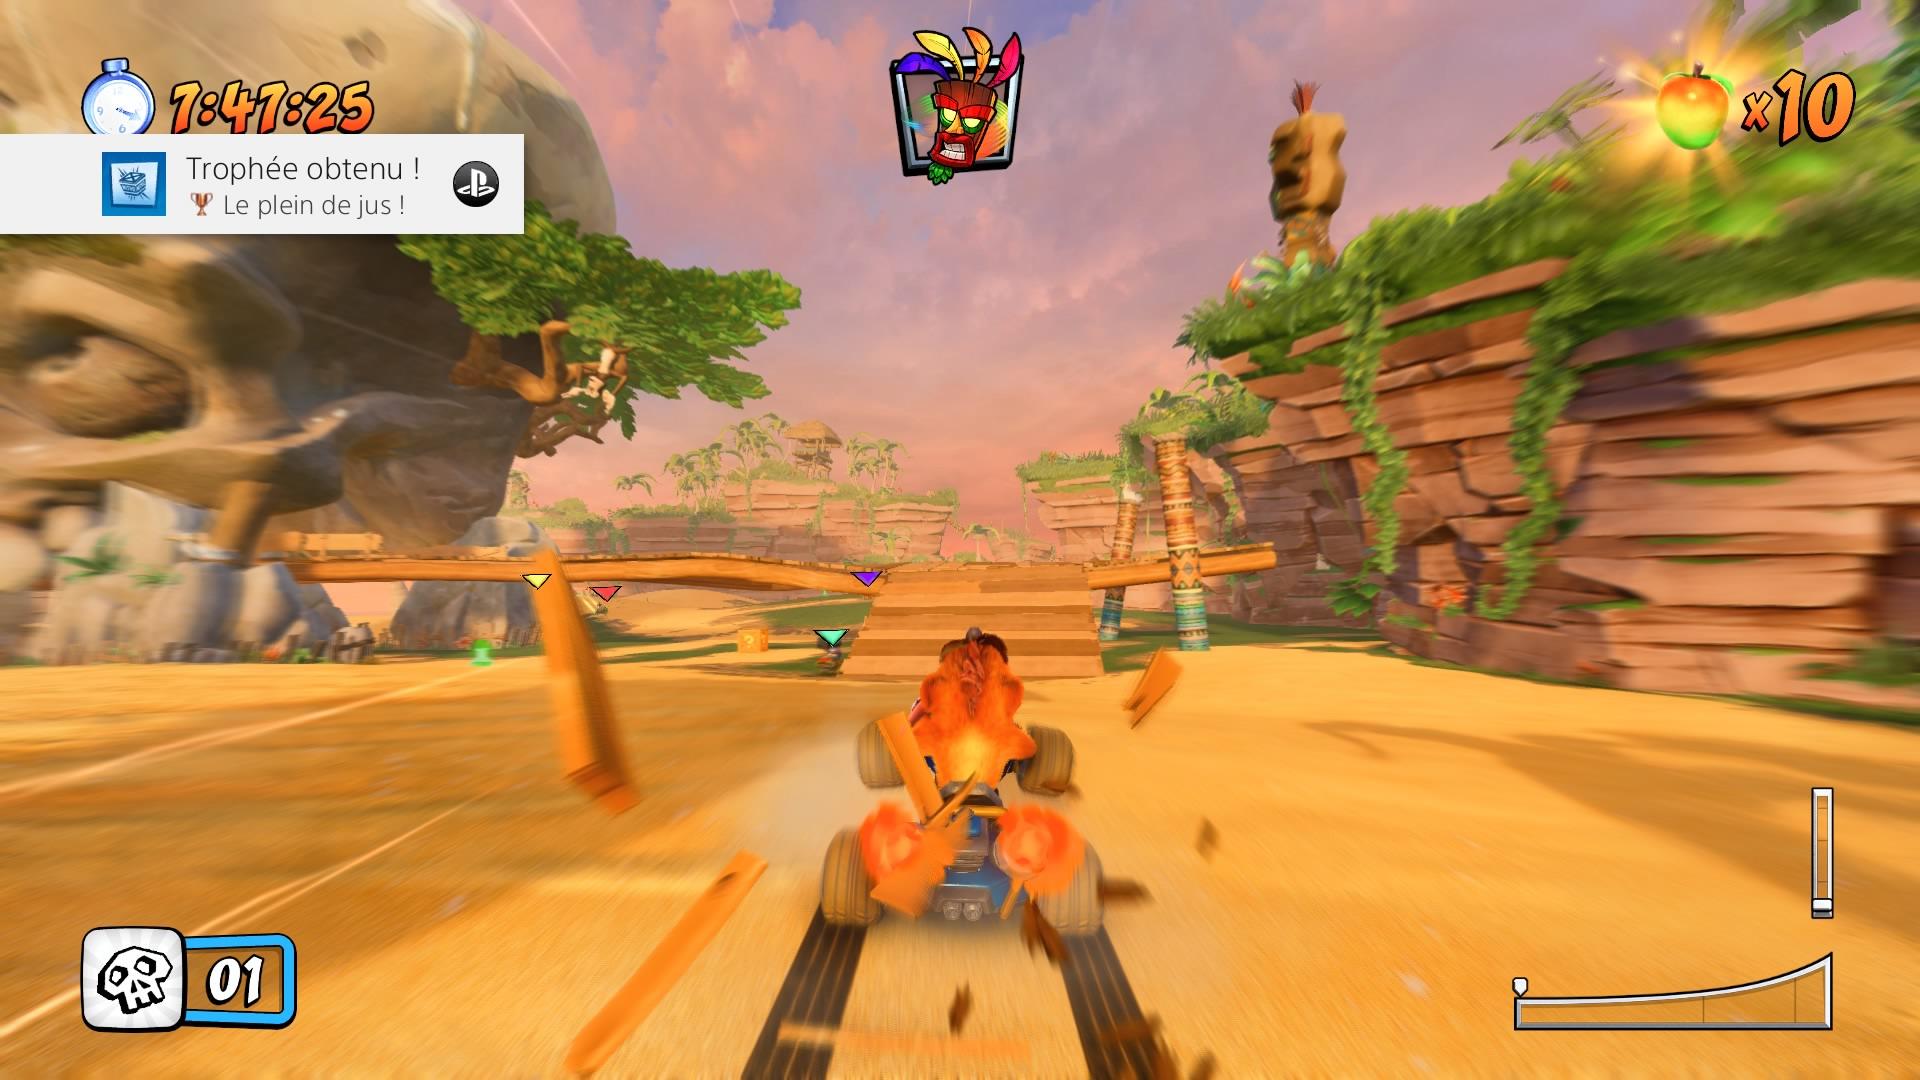 Crash Team Racing Nitro-Fueled